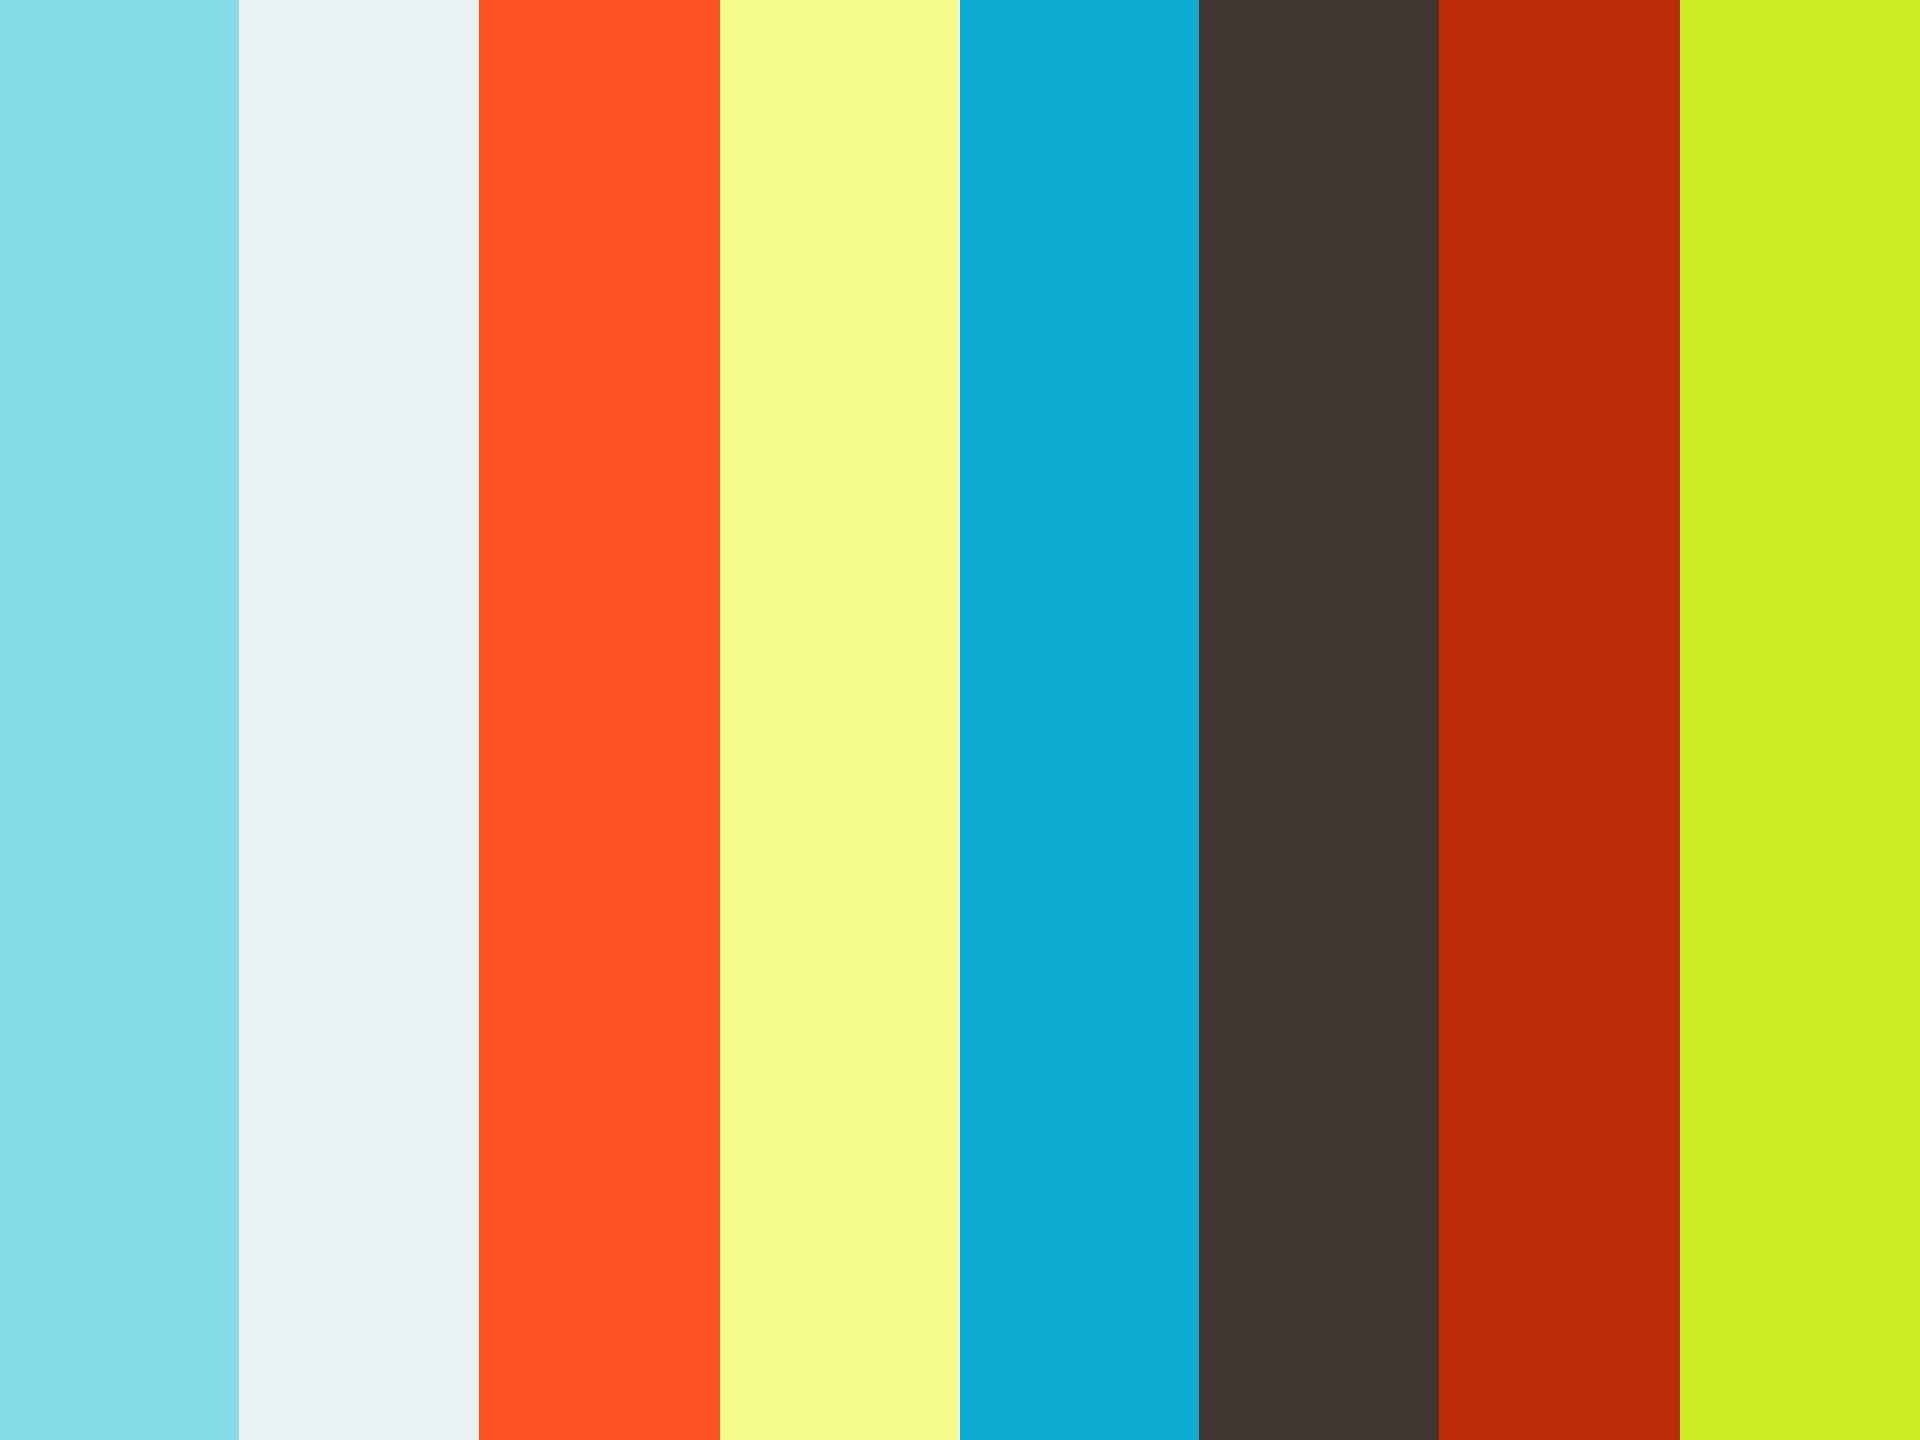 Overlay?src0=https%3a%2f%2fi.vimeocdn.com%2fvideo%2f456736152 1280x720.jpg&src1=https%3a%2f%2ff.vimeocdn.com%2fimages v6%2fshare%2fplay icon overlay